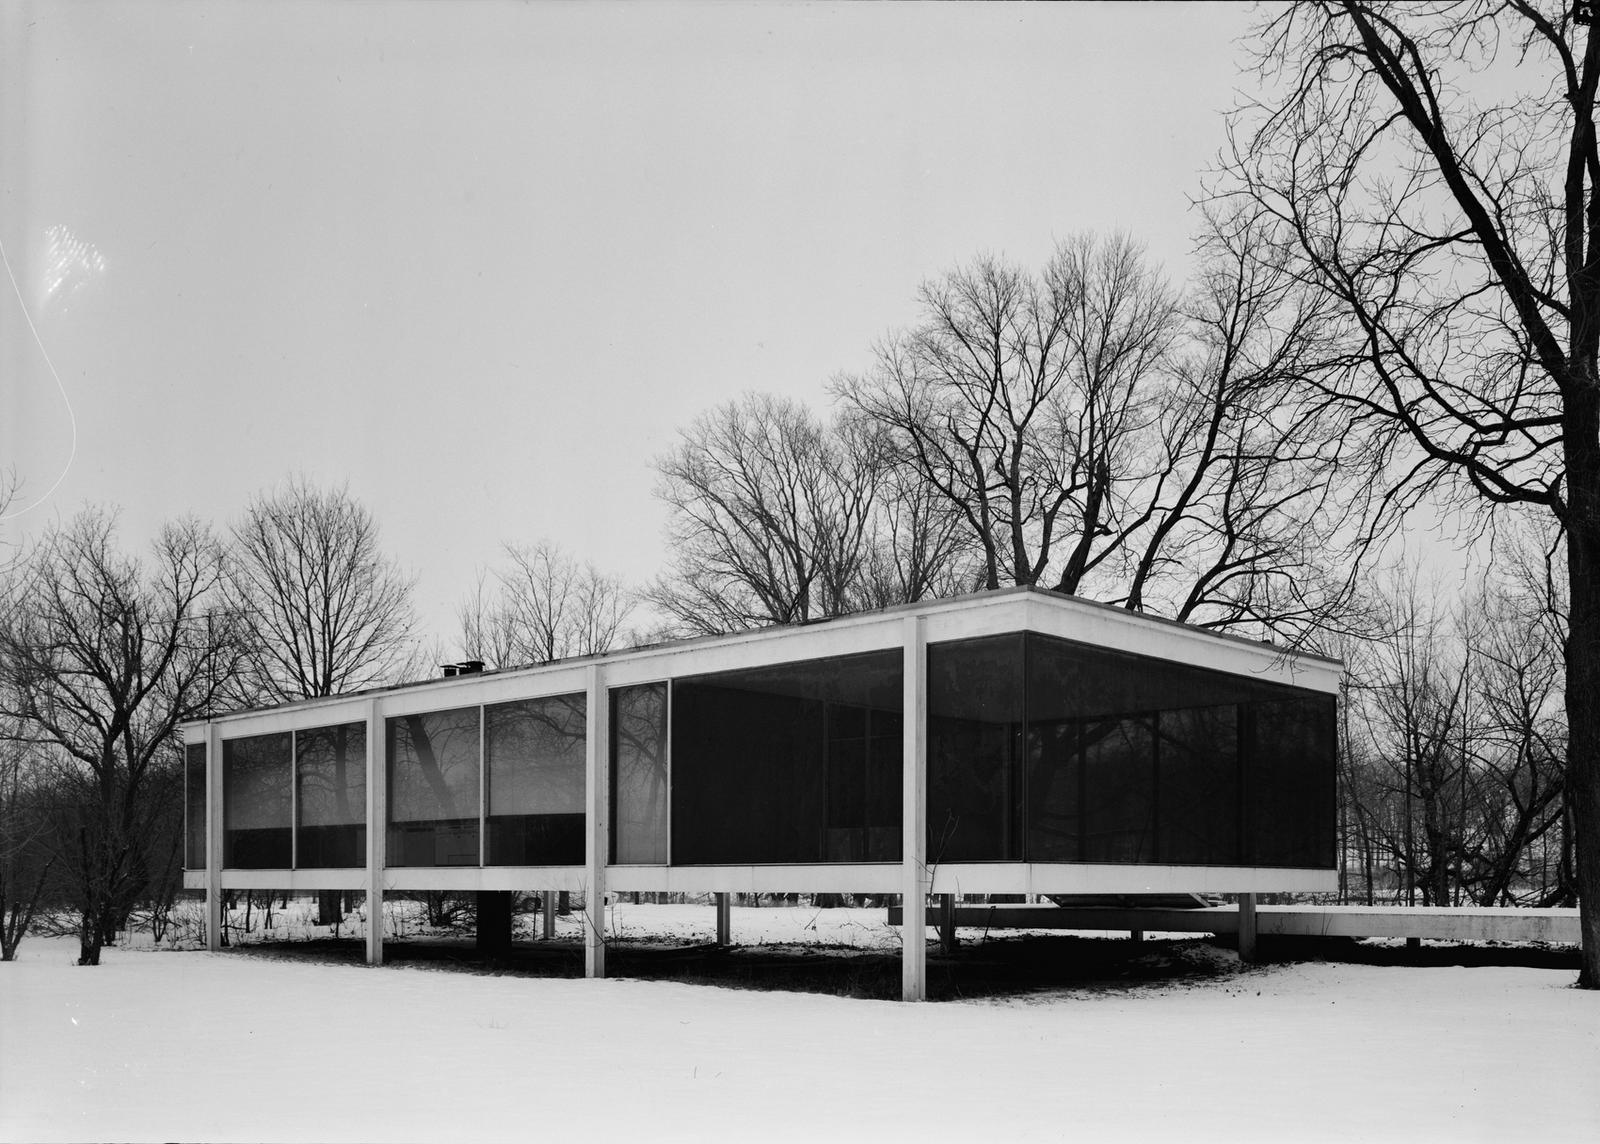 Casa Farnsworth 19451950 Implantao em 1946 Mies Van Der